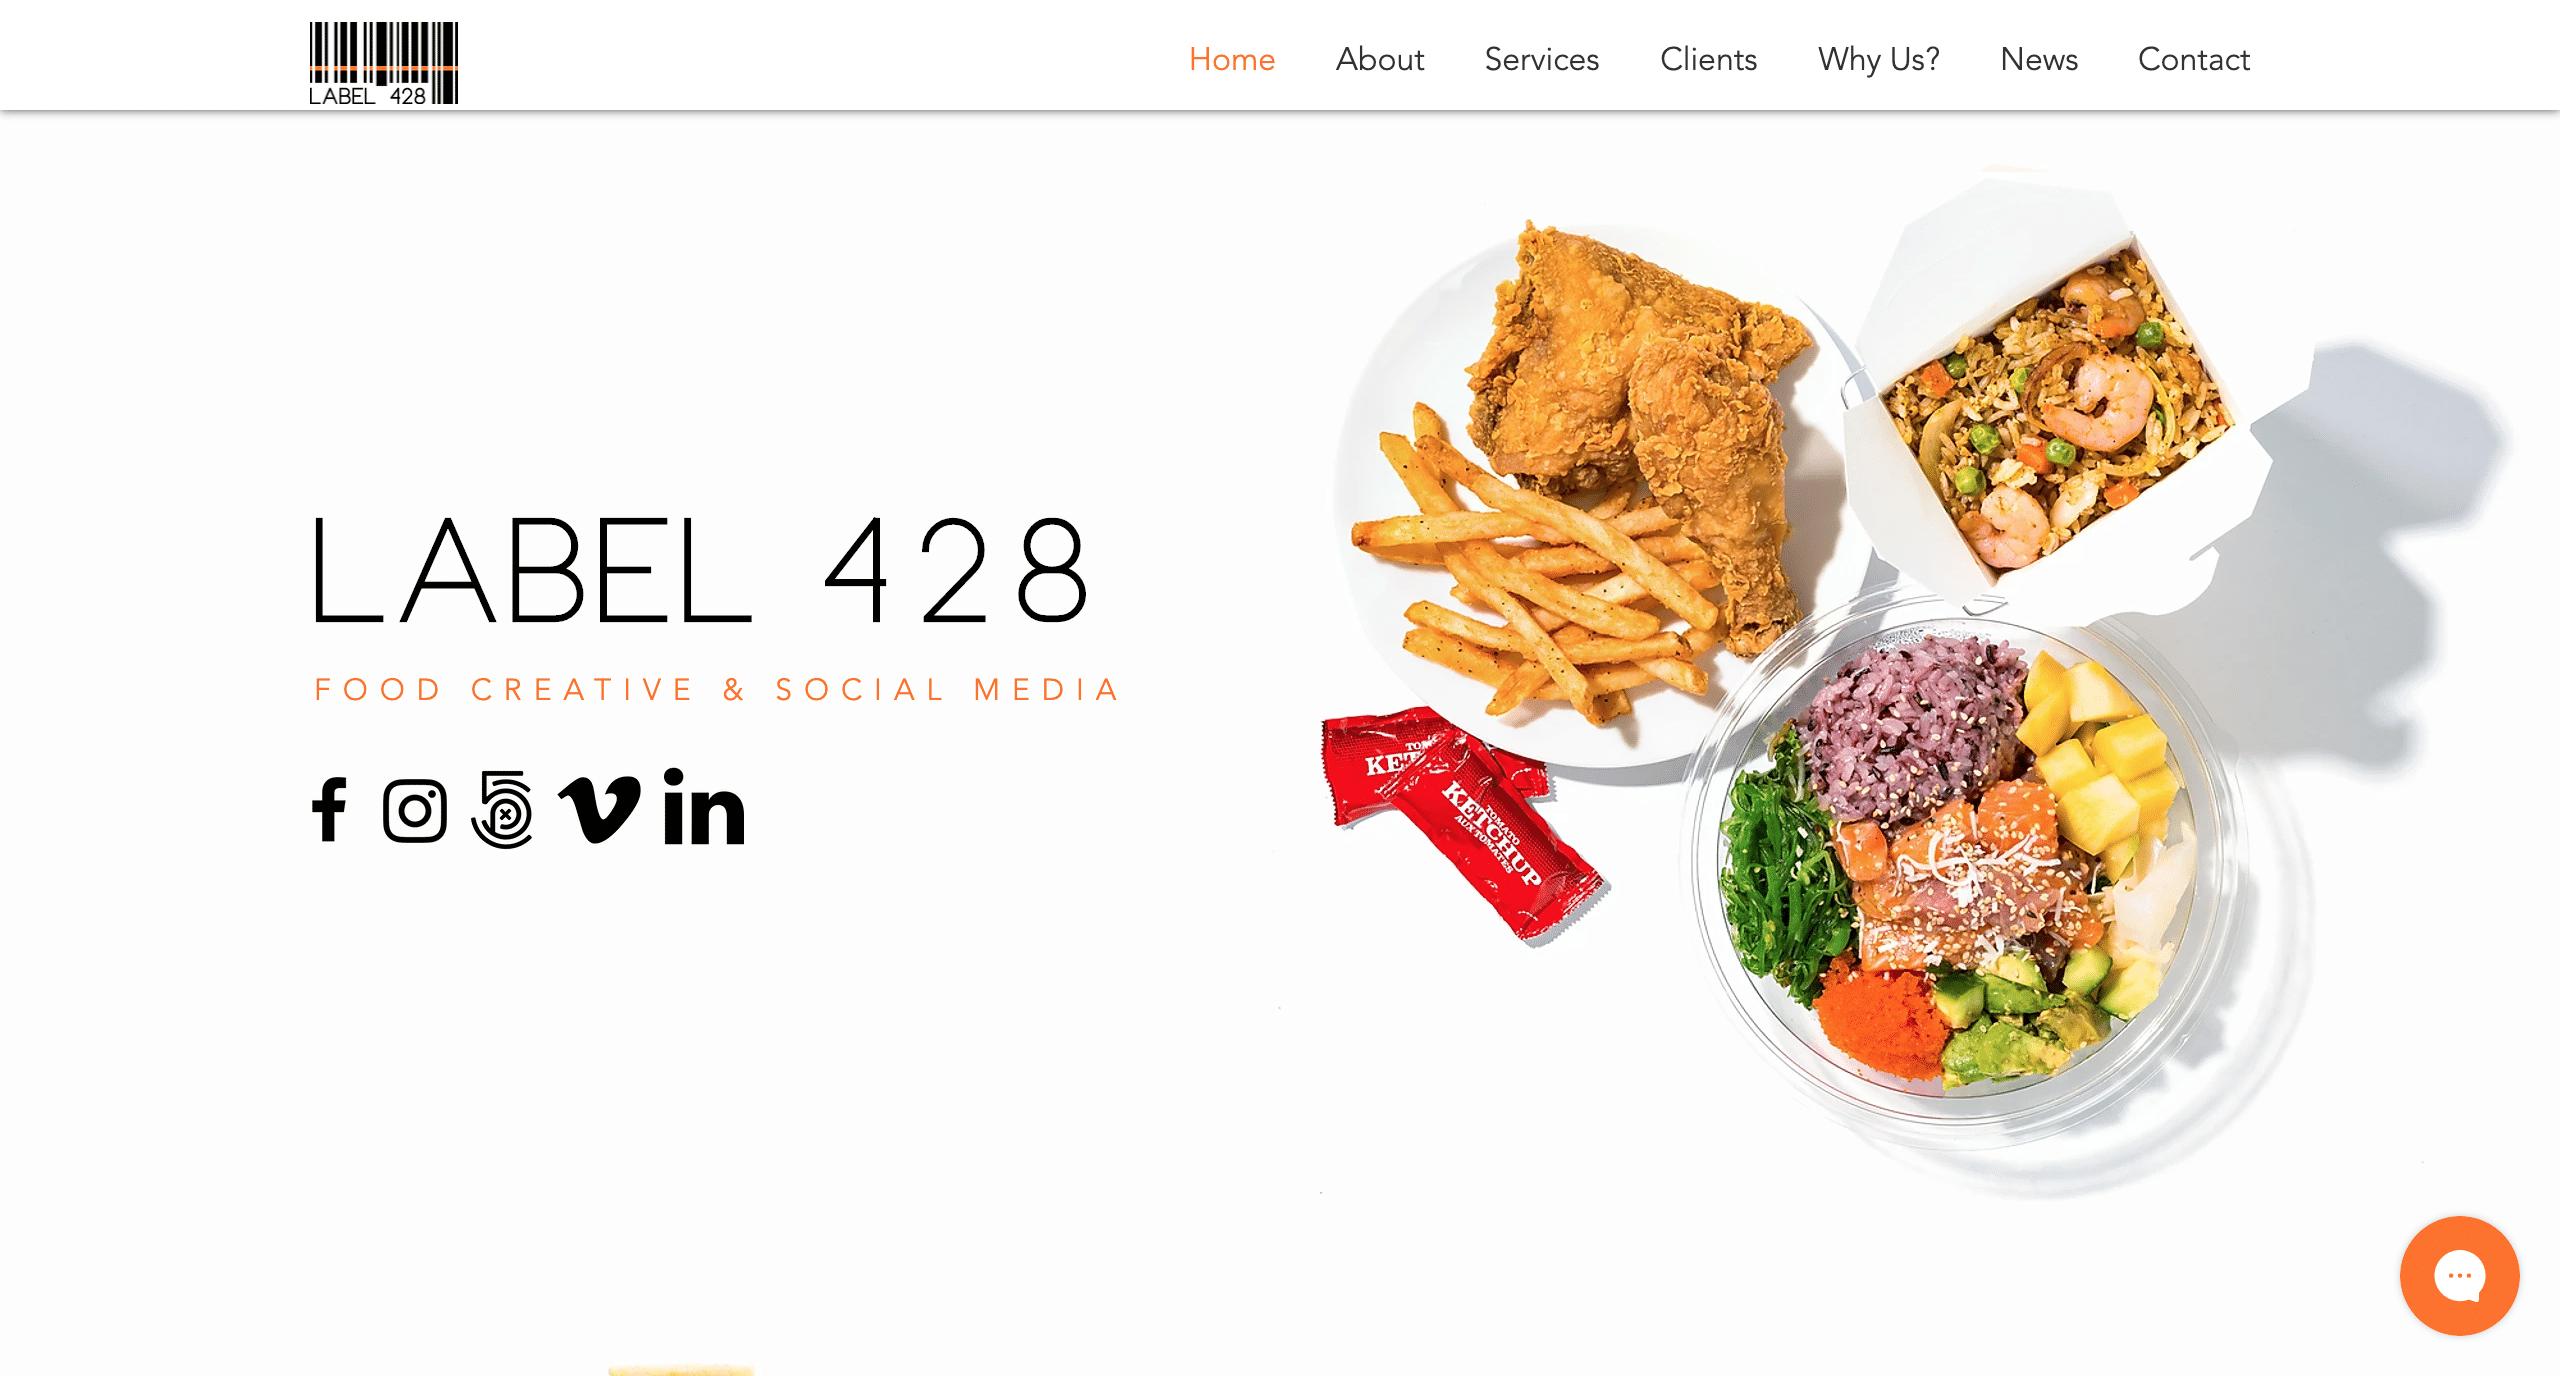 Label 428